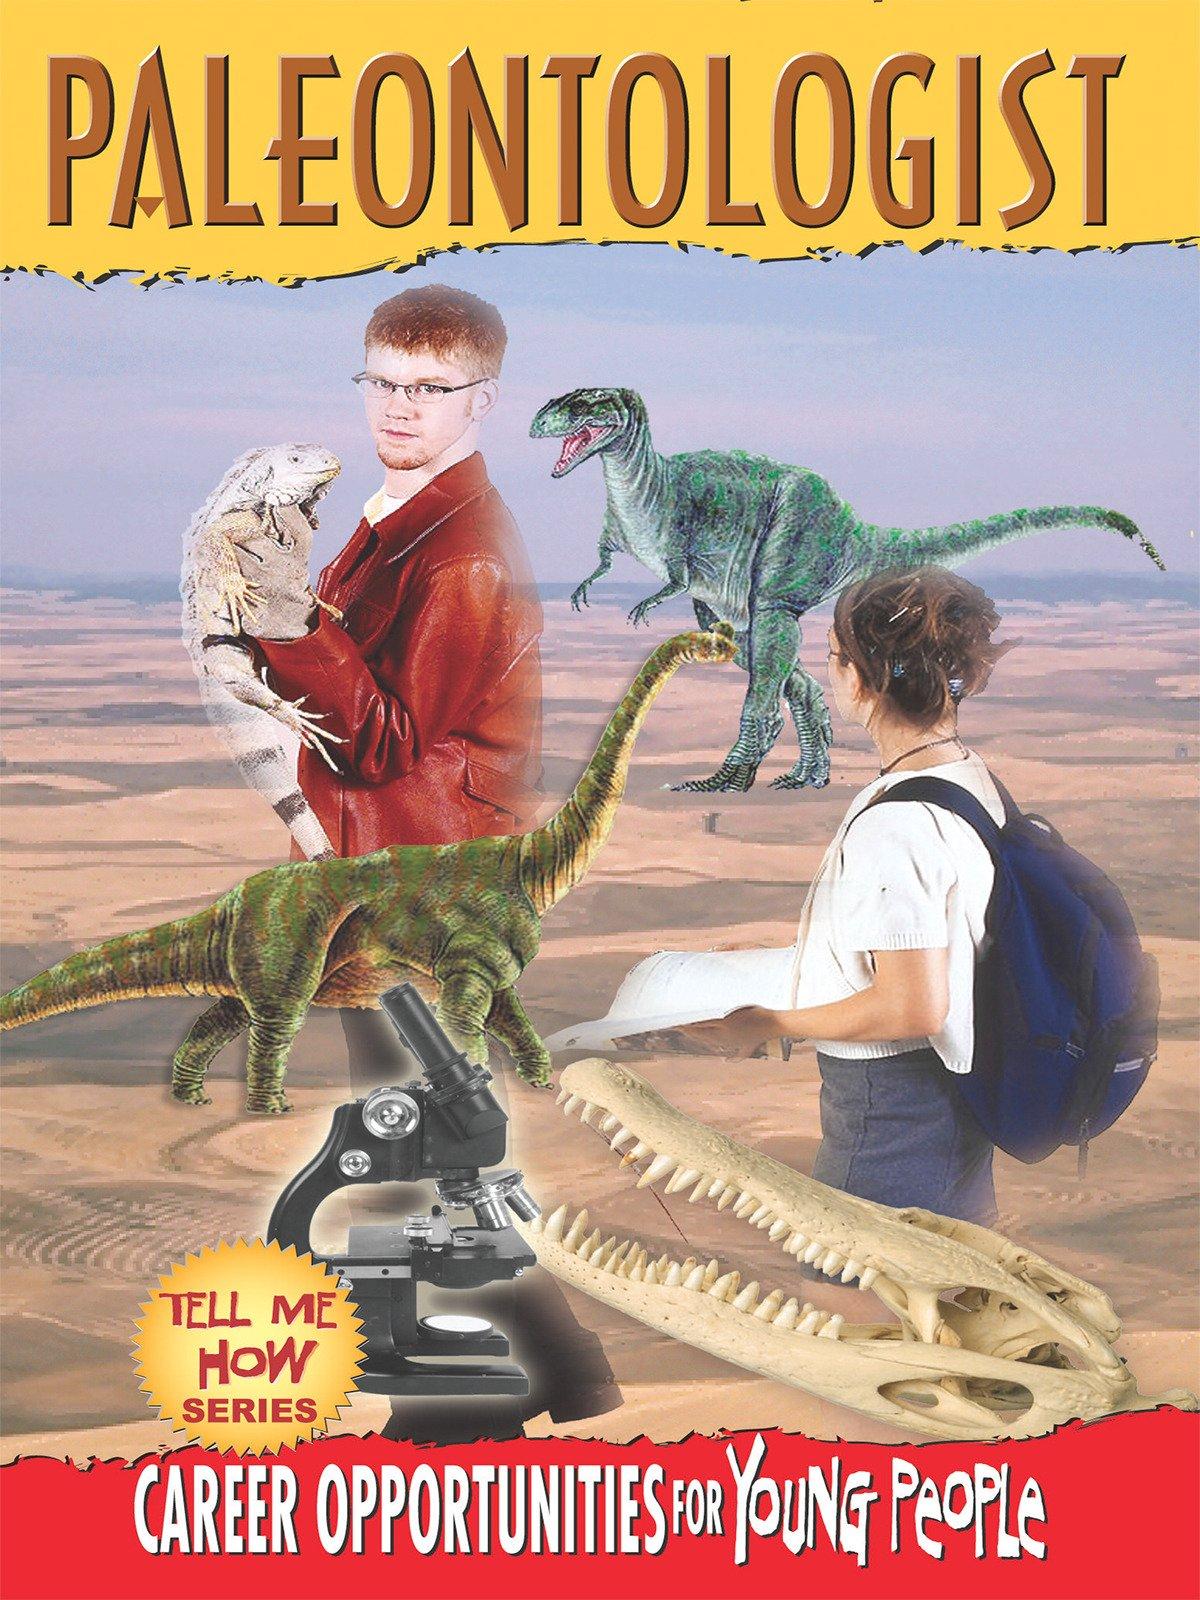 Tell Me How Career Series: Paleontologist